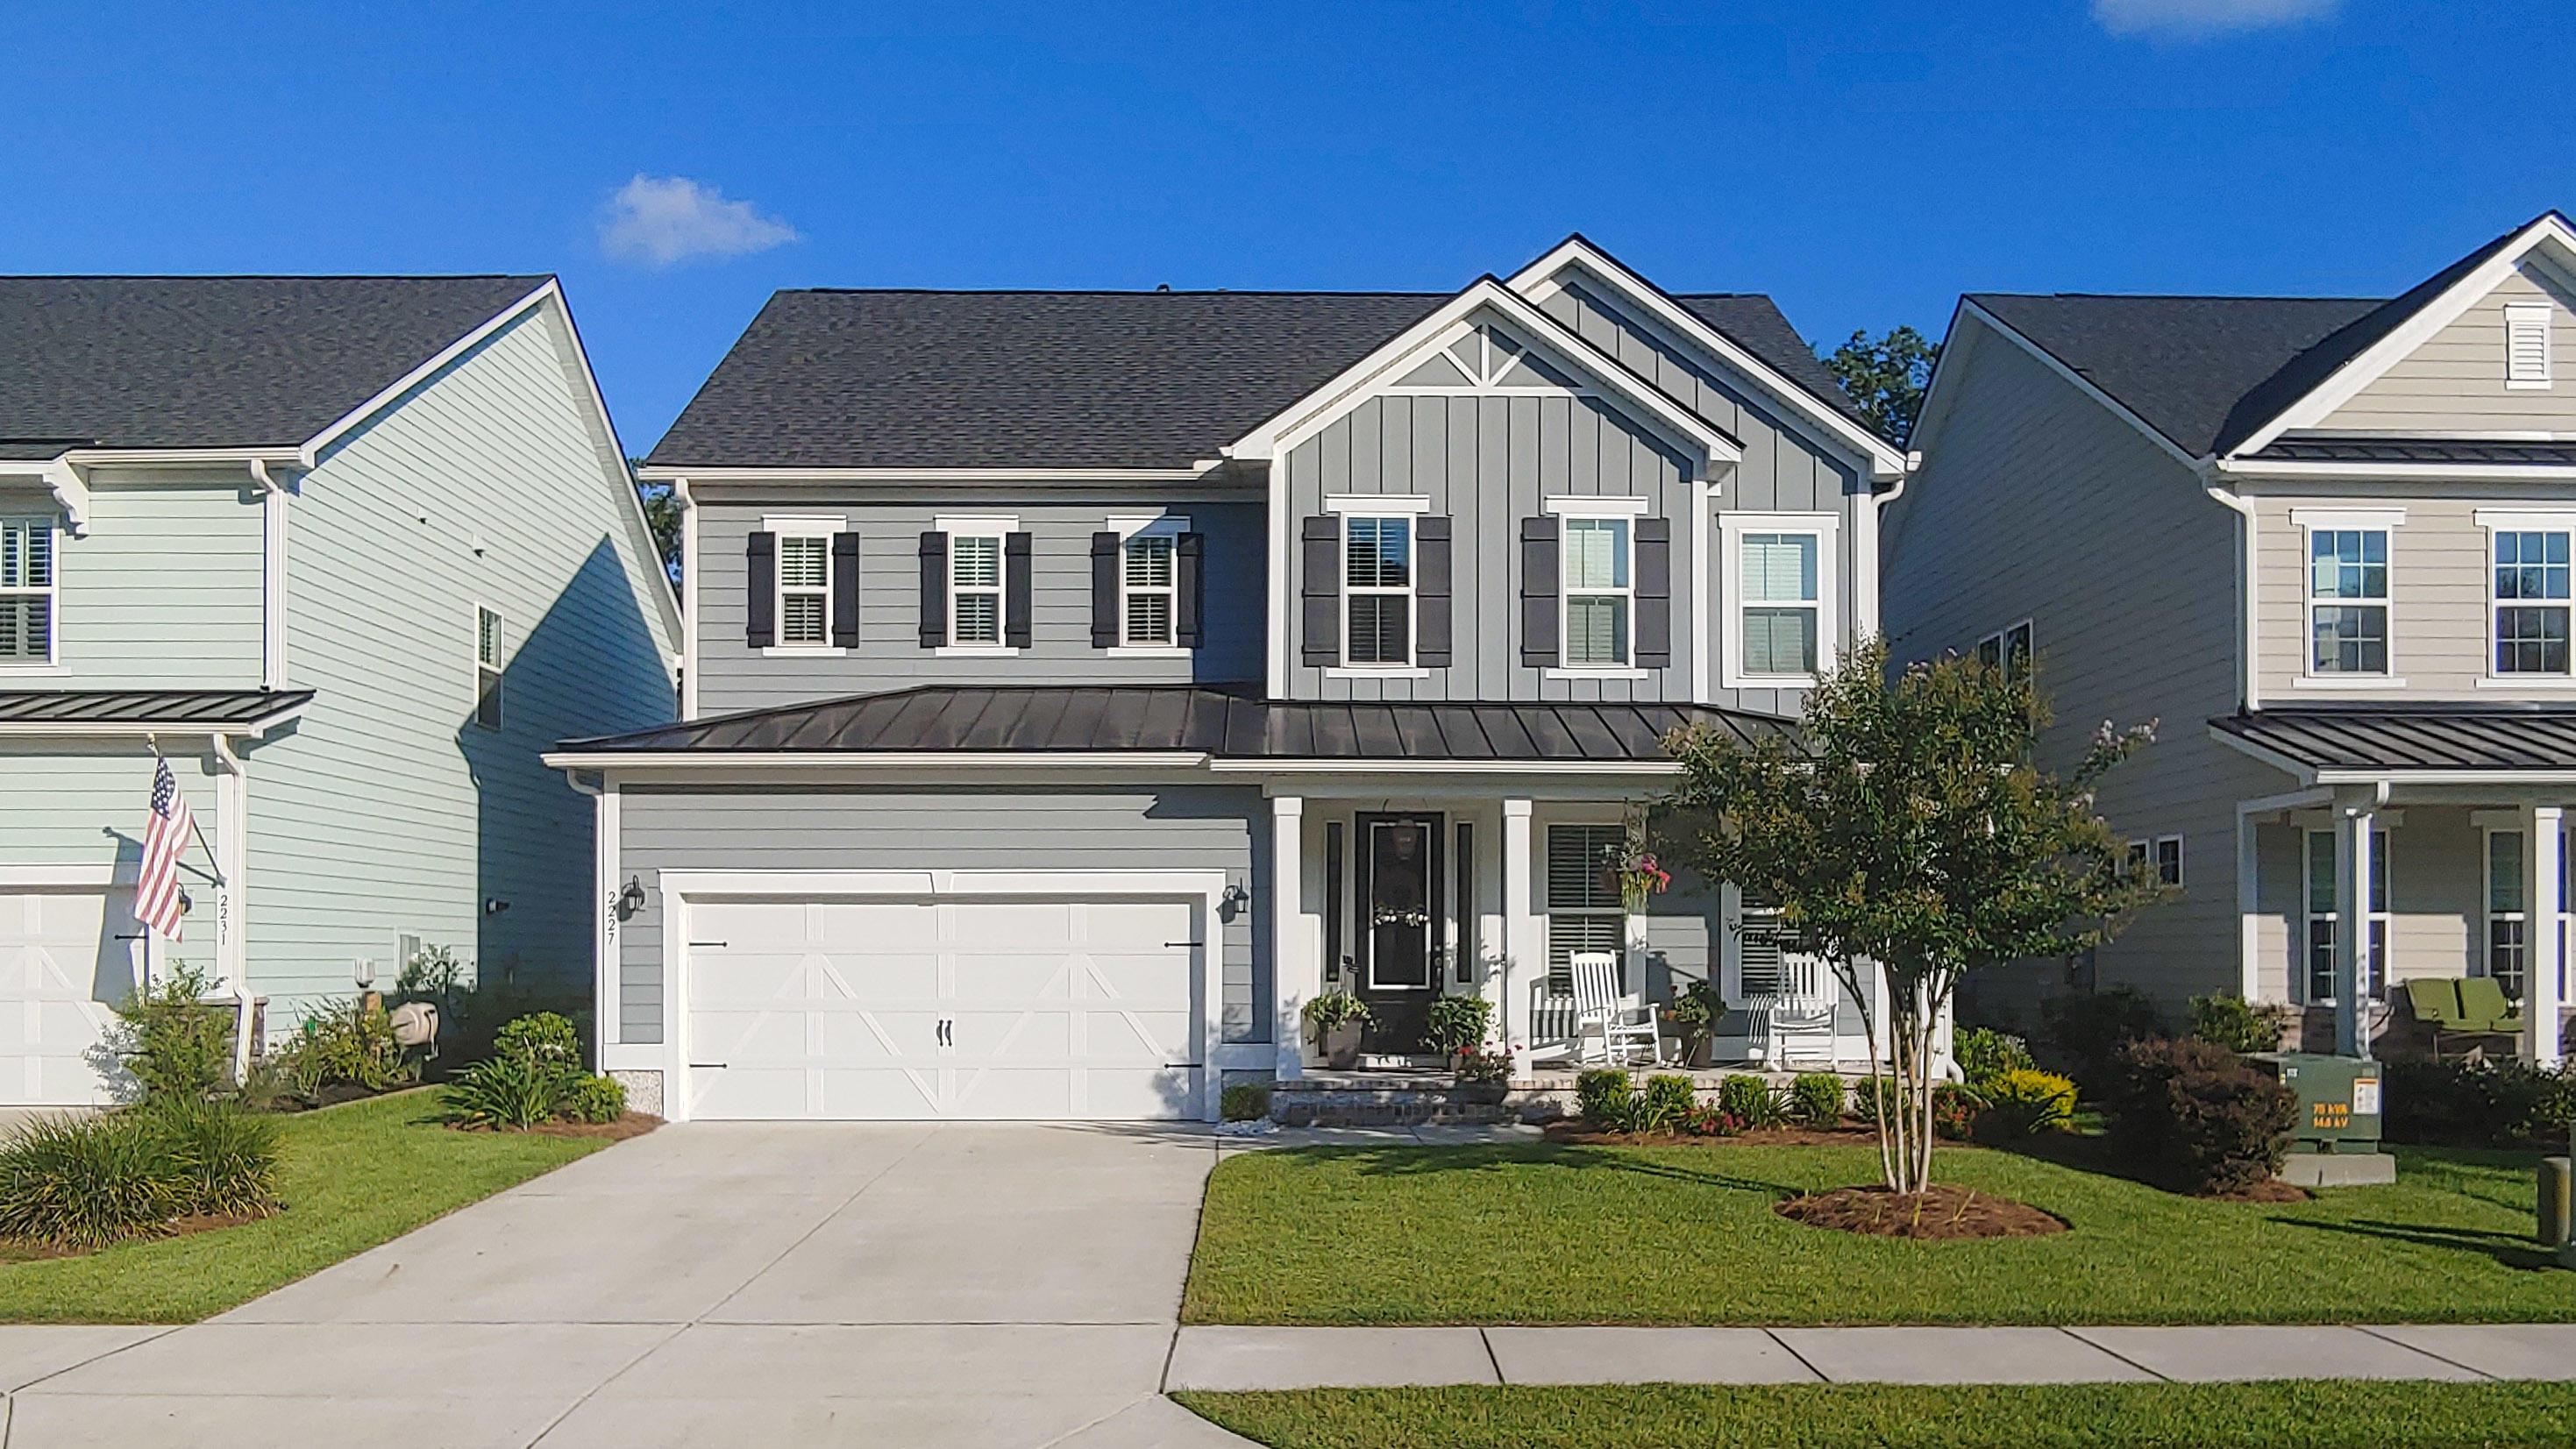 Magnolia Village Homes For Sale - 2227 Spring Hope, Mount Pleasant, SC - 5